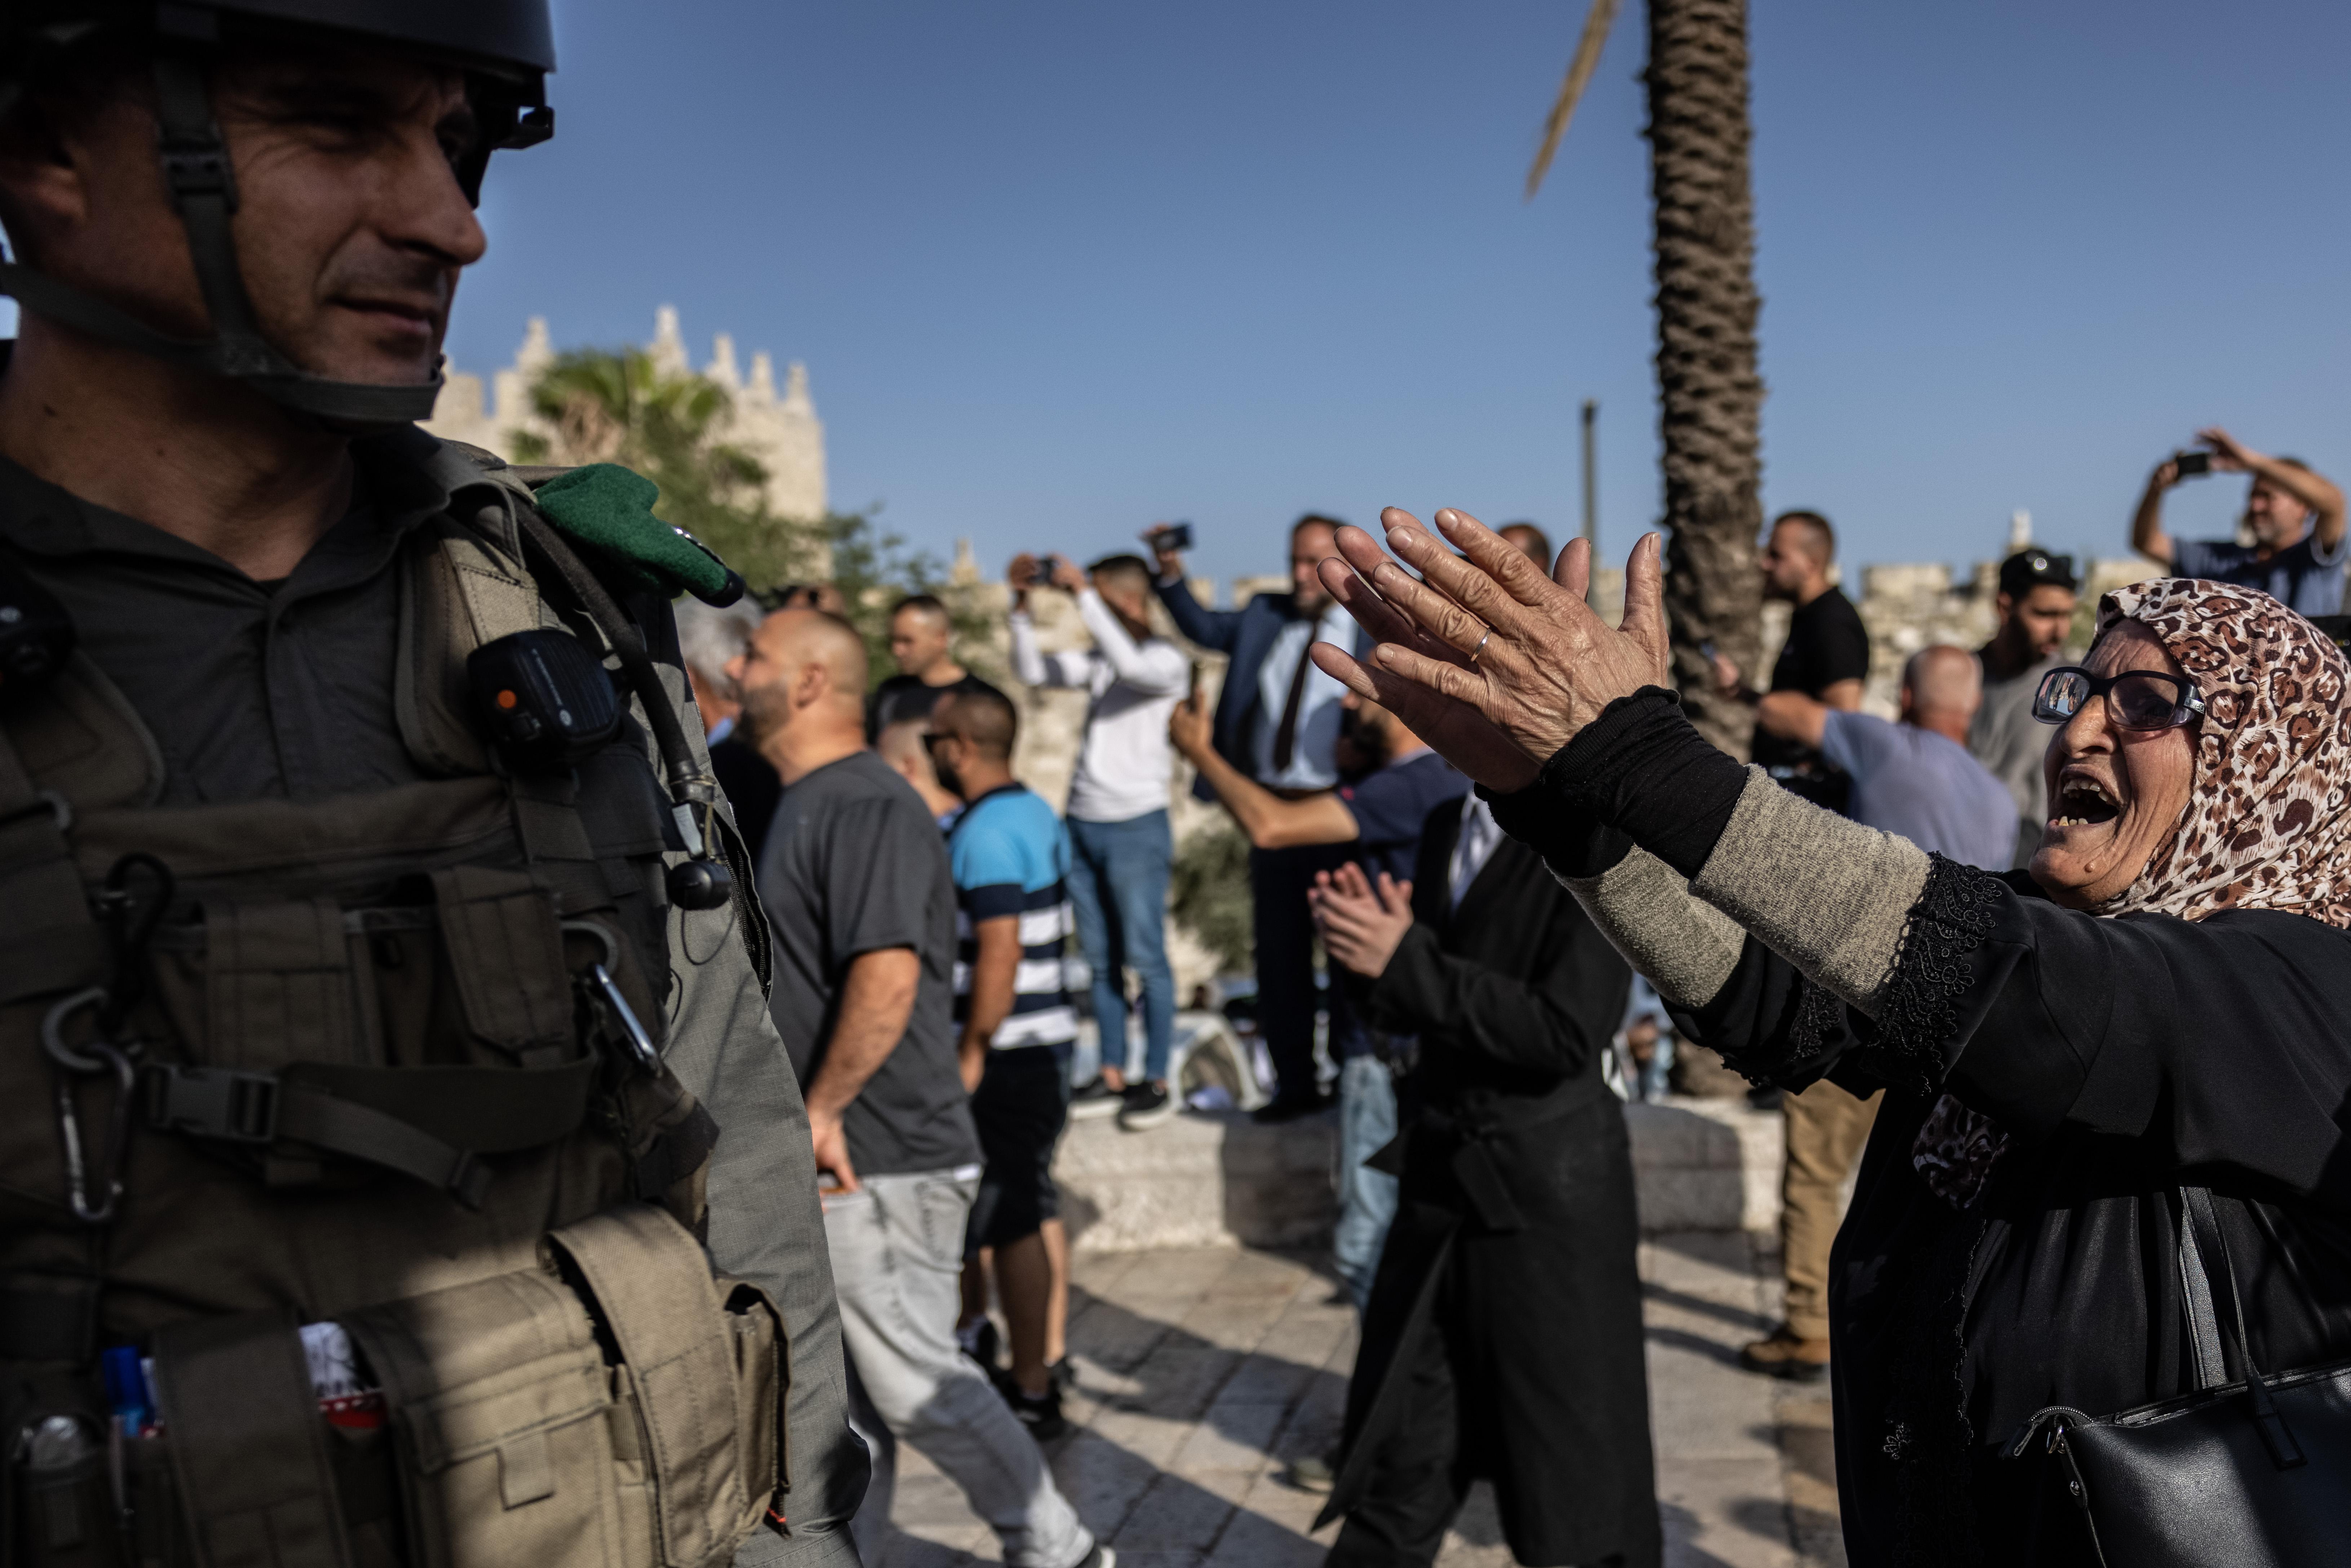 A Palestinian activist confronts a soldier in Jerusalem.